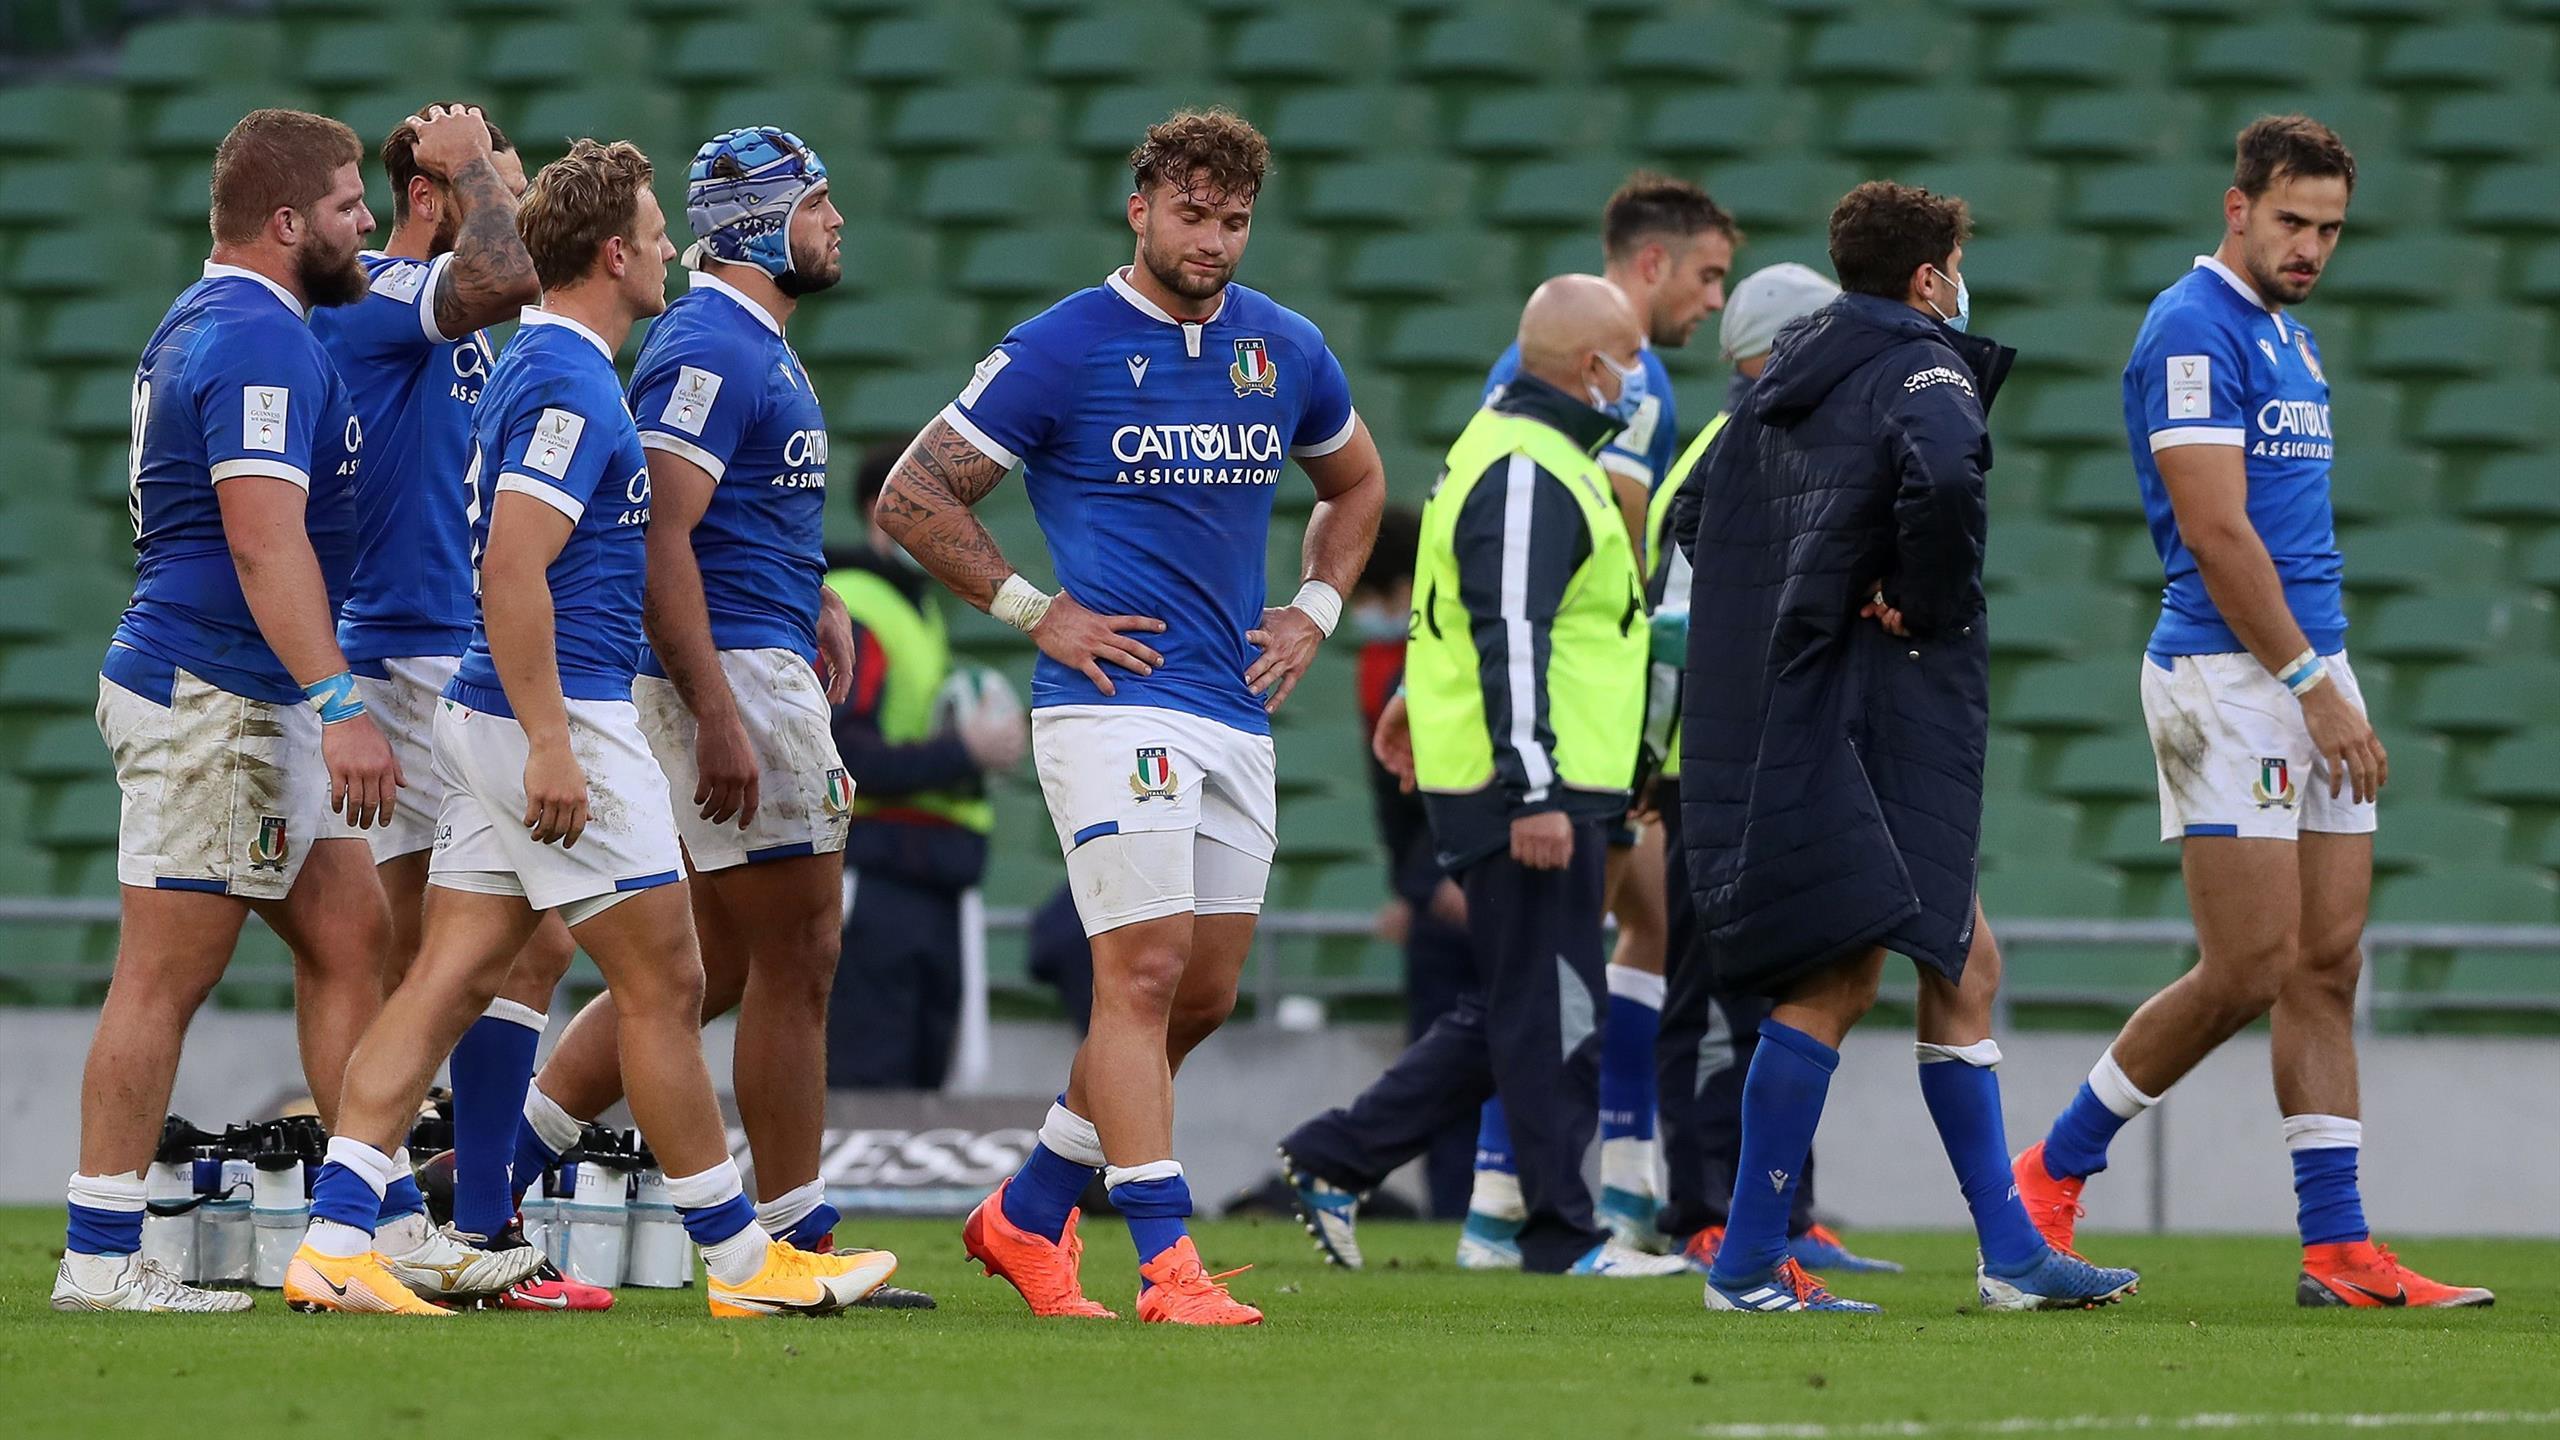 Italia Inghilterra In Diretta Tv E Live Streaming Eurosport